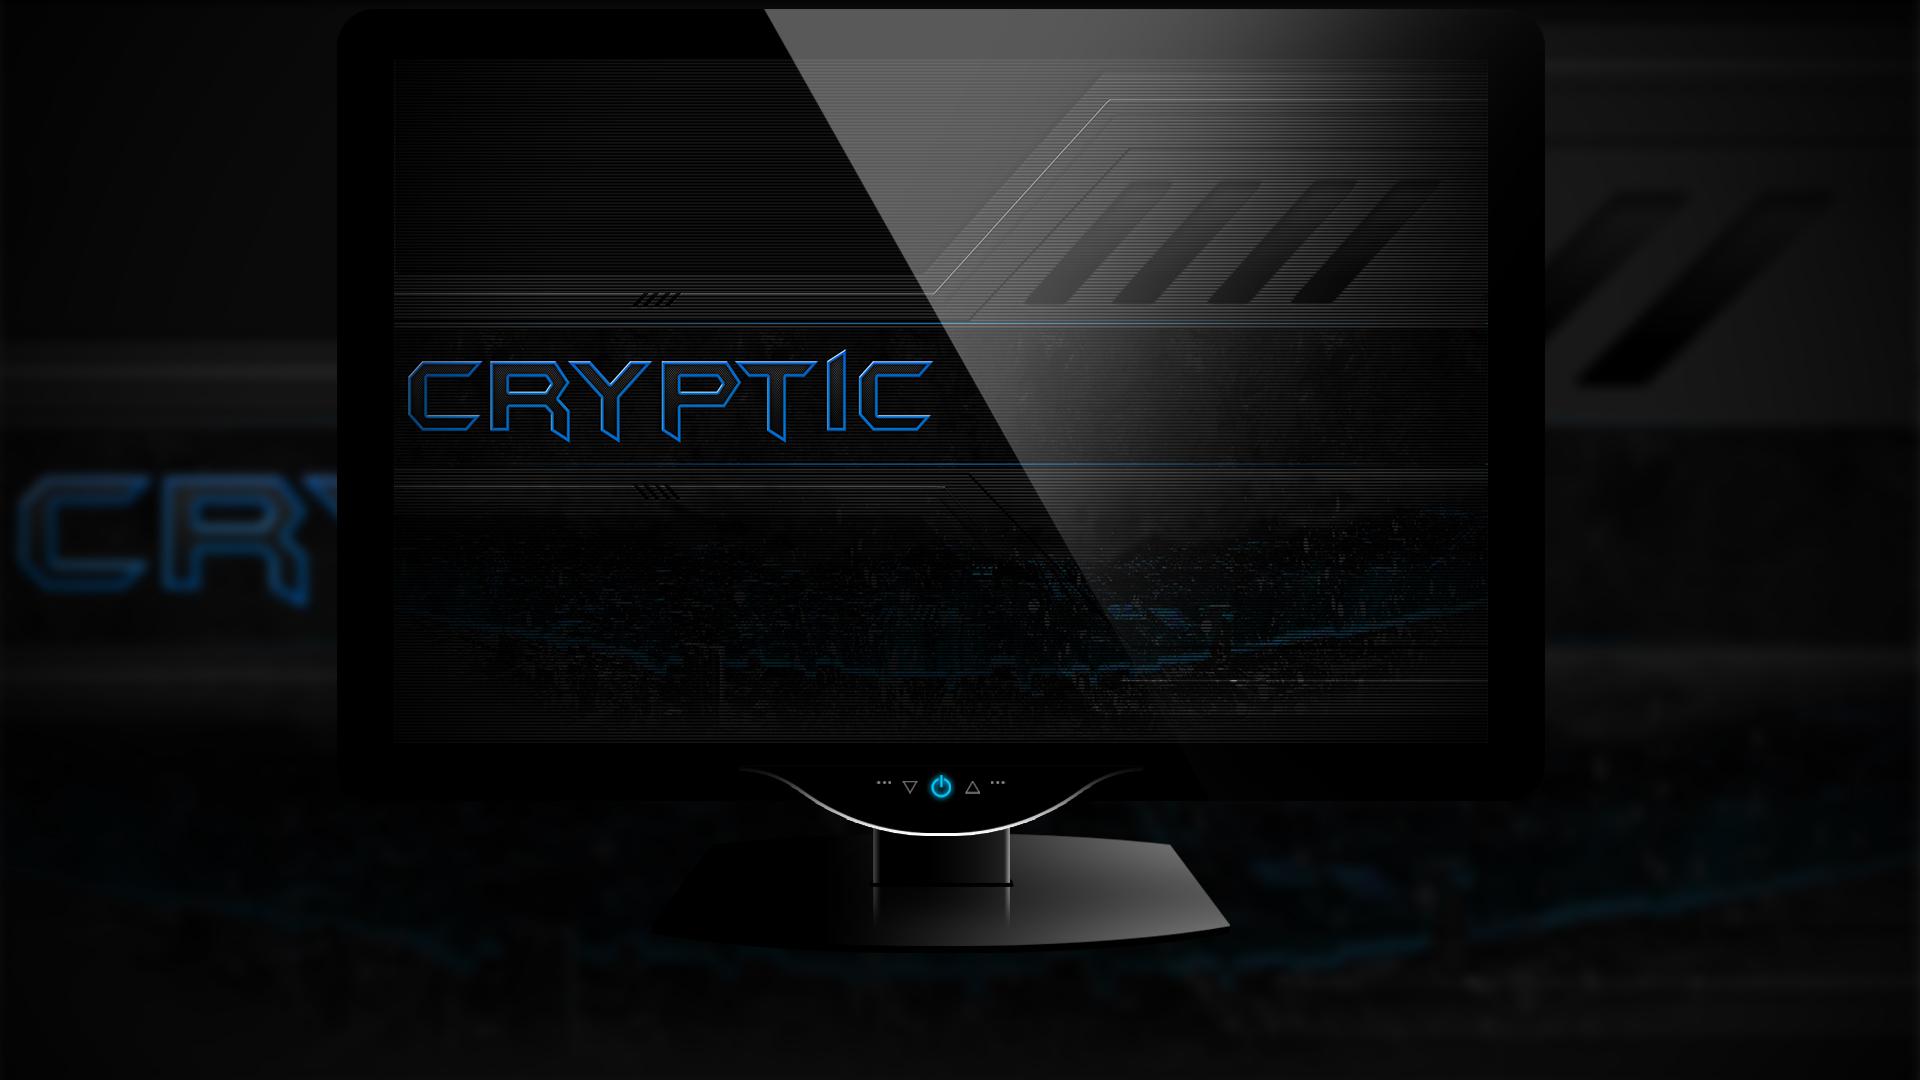 cryptic wallpaper - photo #4